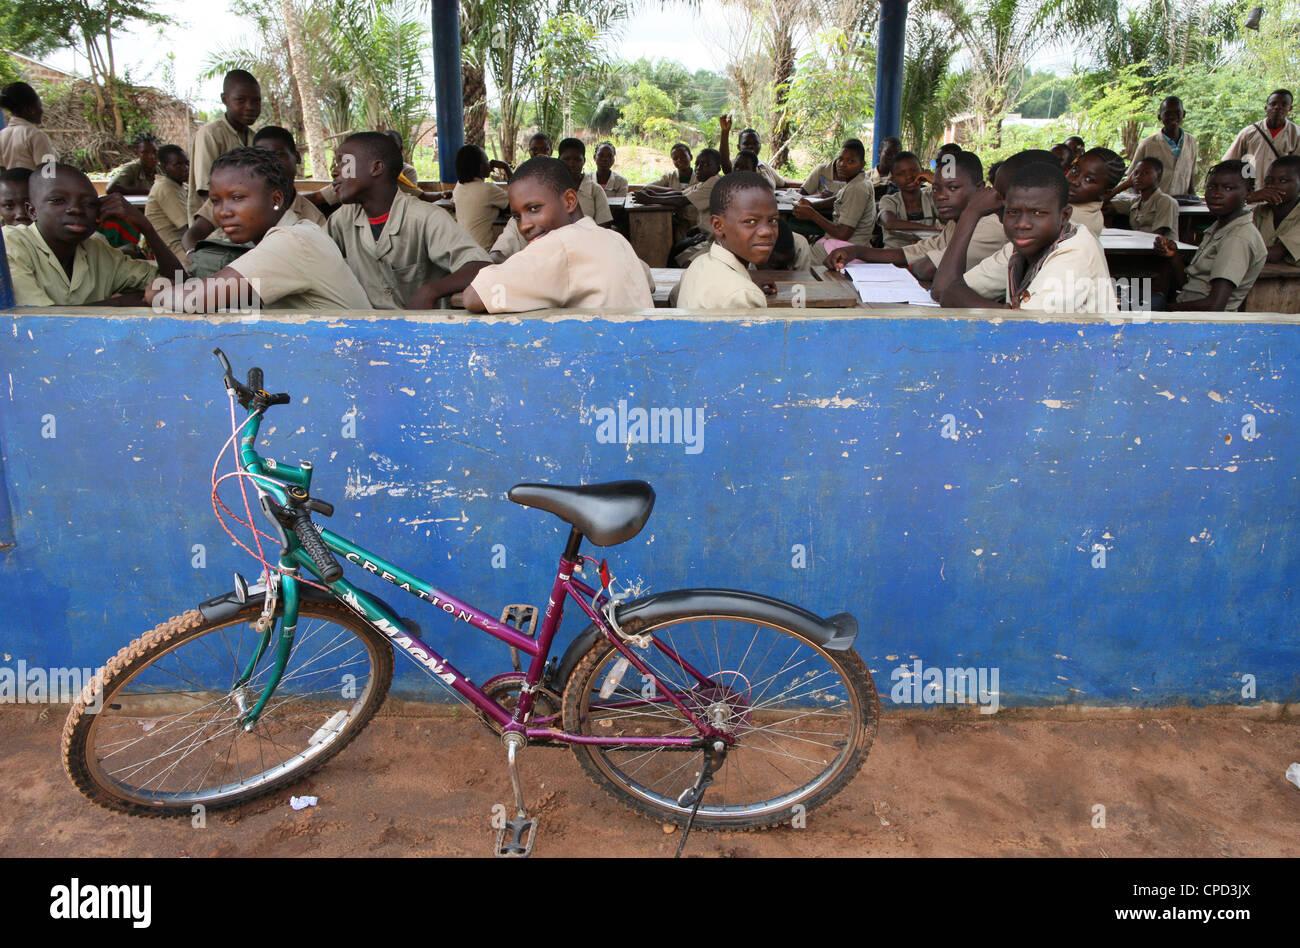 Secondary school in Africa, Hevie, Benin, West Africa, Africa Stock Photo